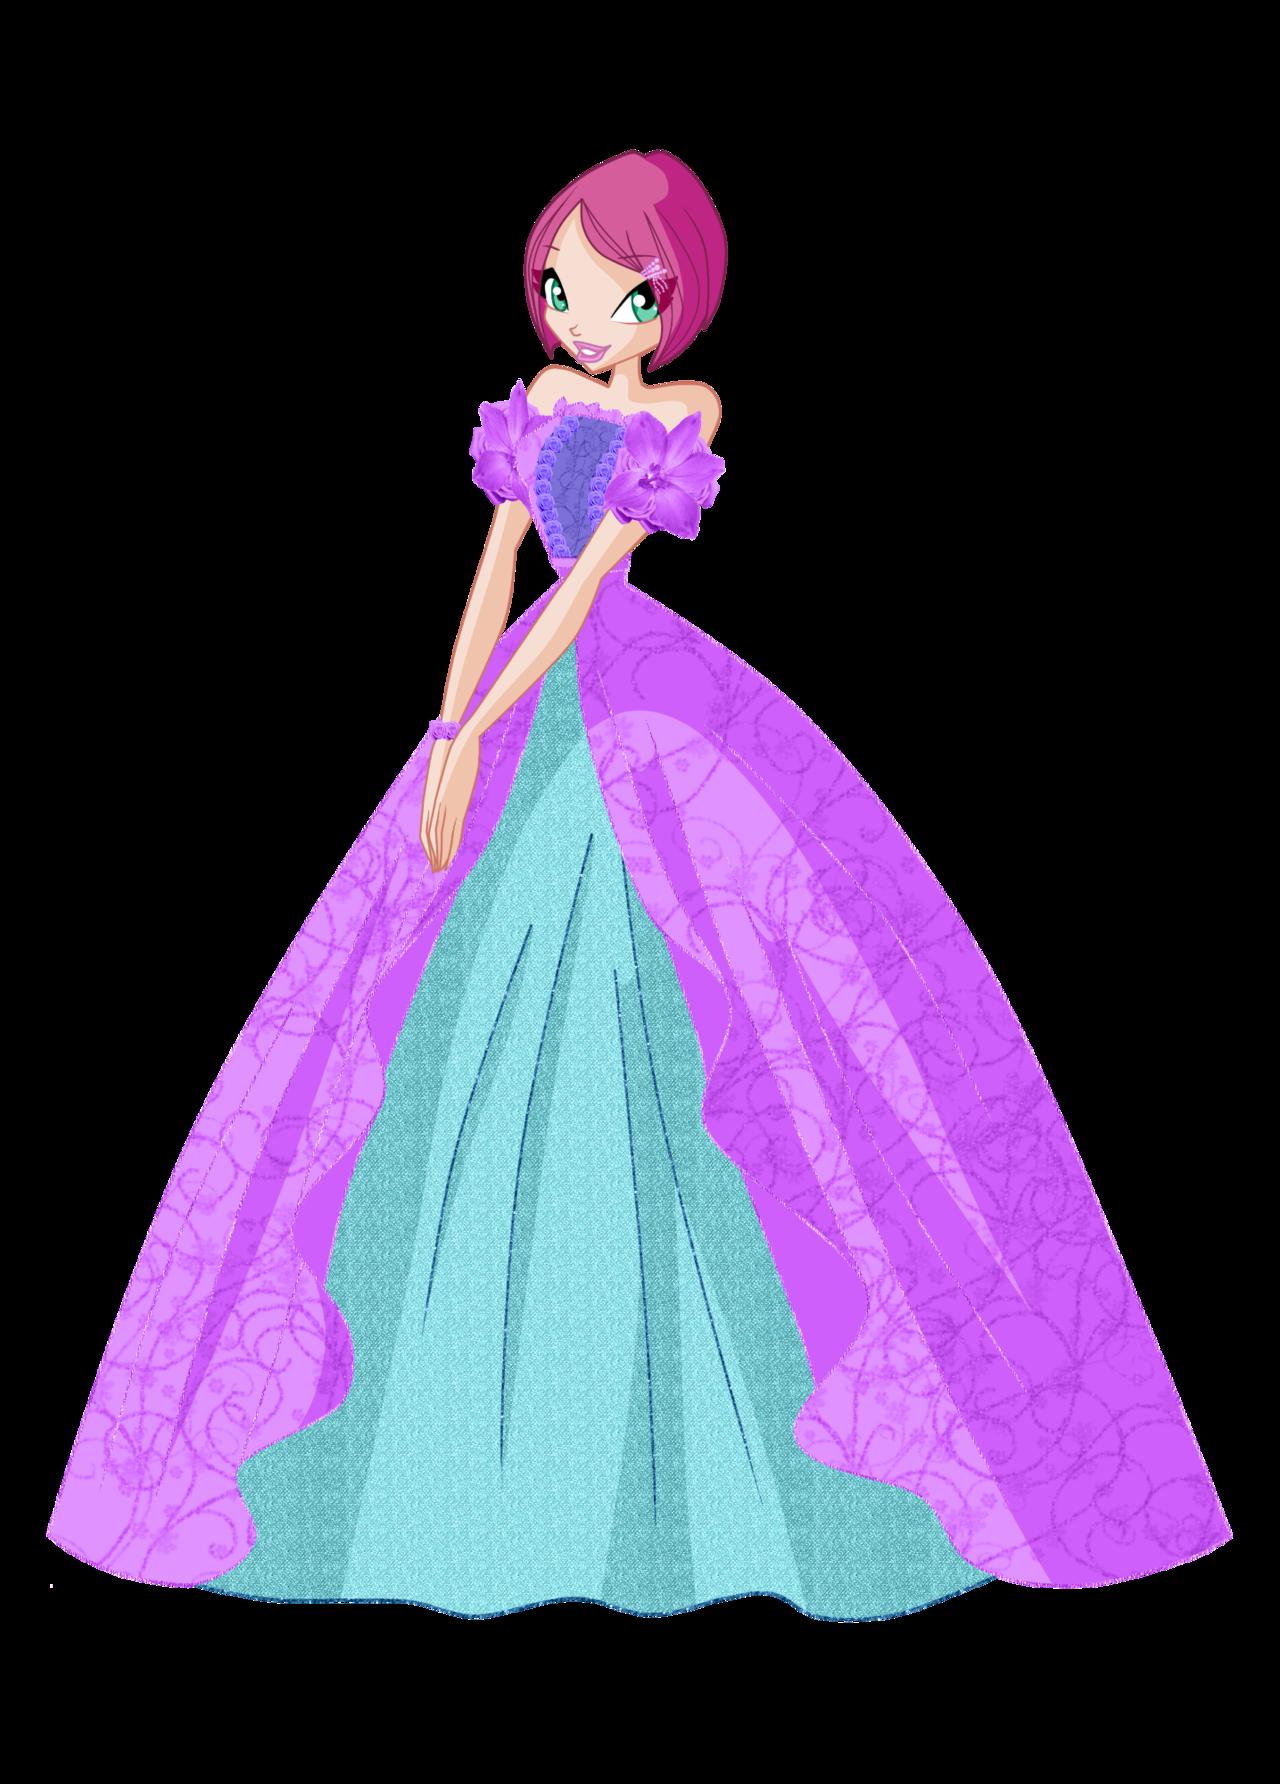 Dress up winx club - Winx Club Roxy Dress The Winx Club Tecna